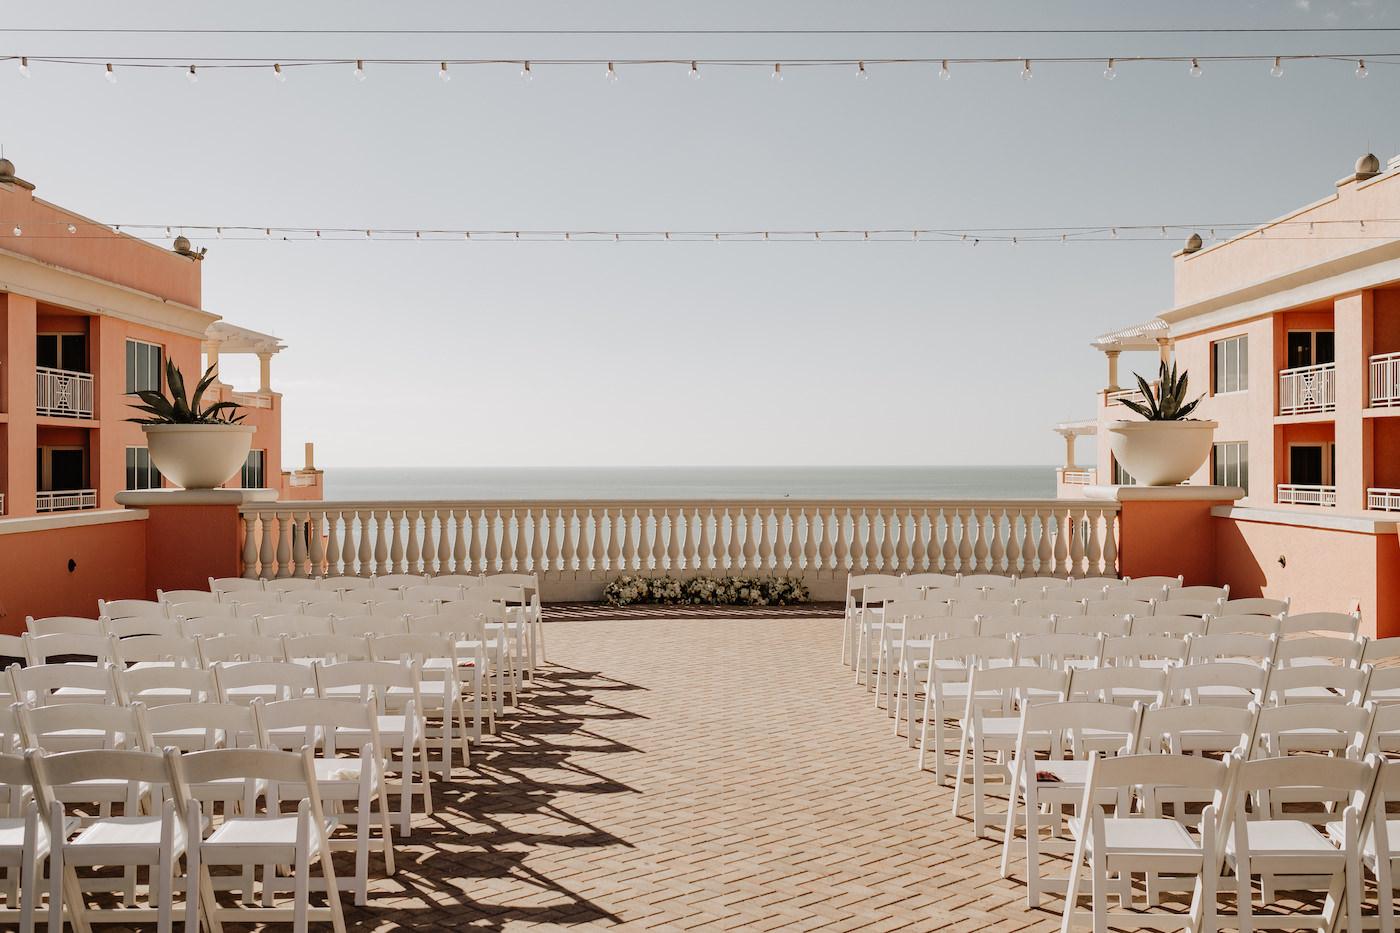 Clearwater Beach Wedding Venue Hyatt Regency Clearwater Beach Hotel   Outdoor Rooftop Waterfront Wedding Ceremony with White Garden Chairs